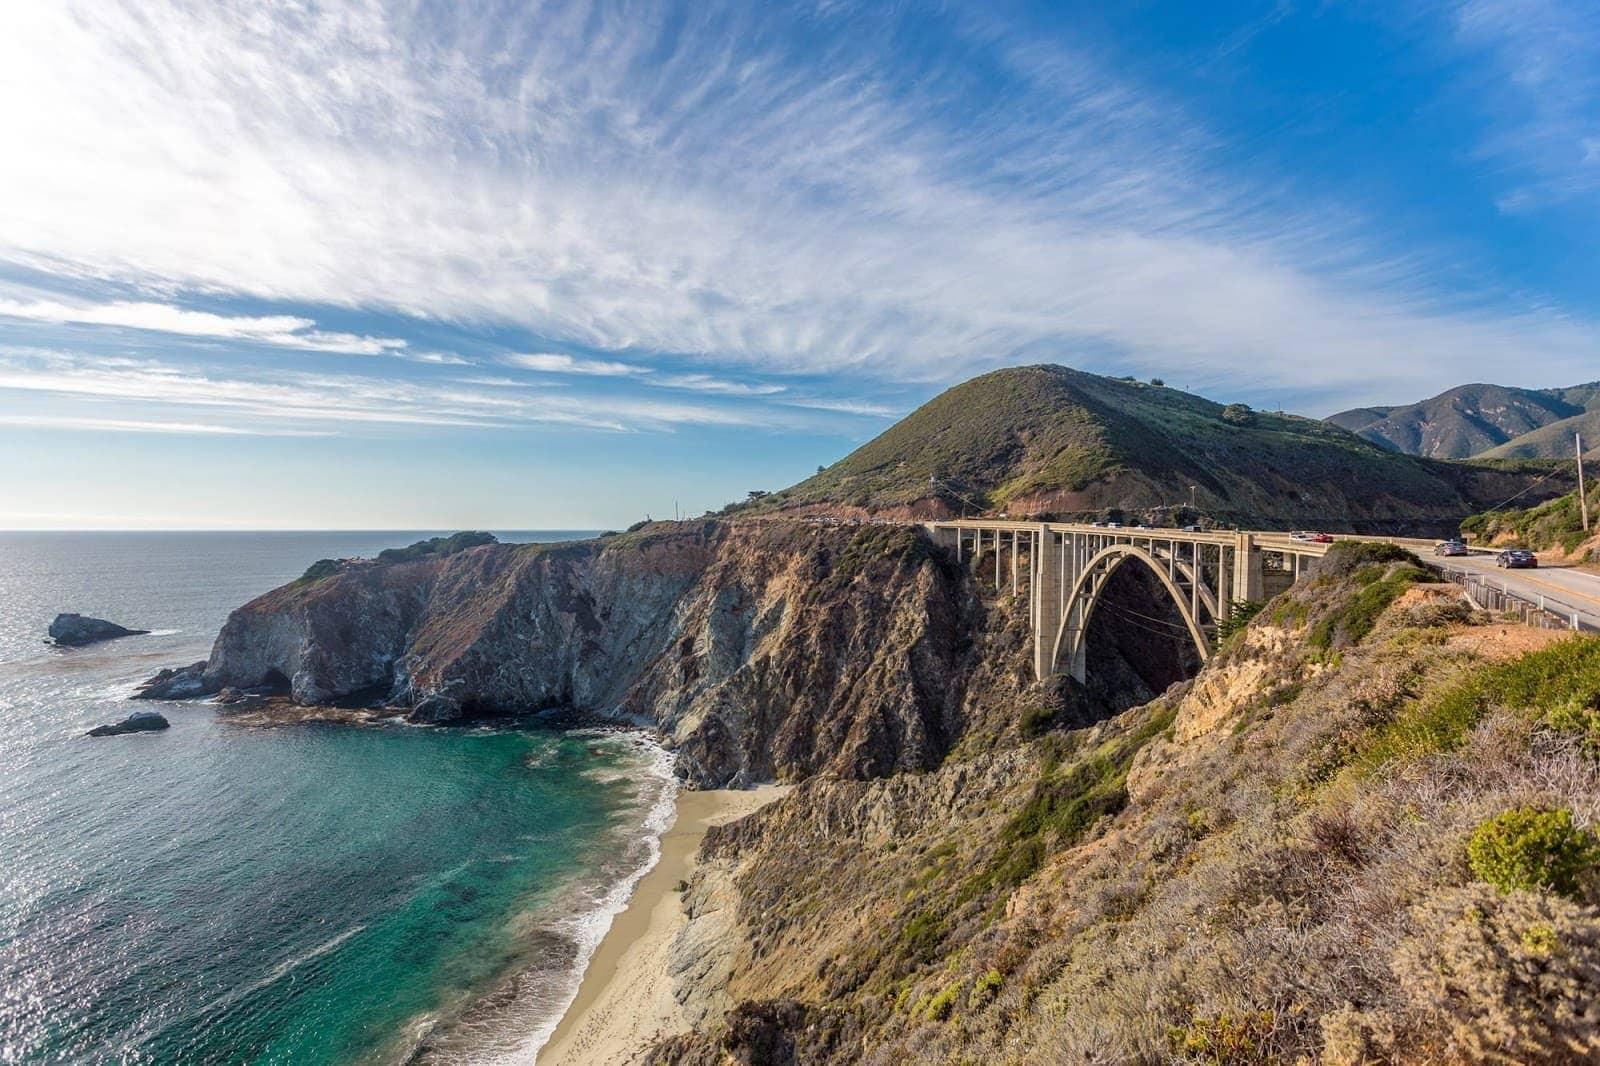 Pacific Coast Highway California